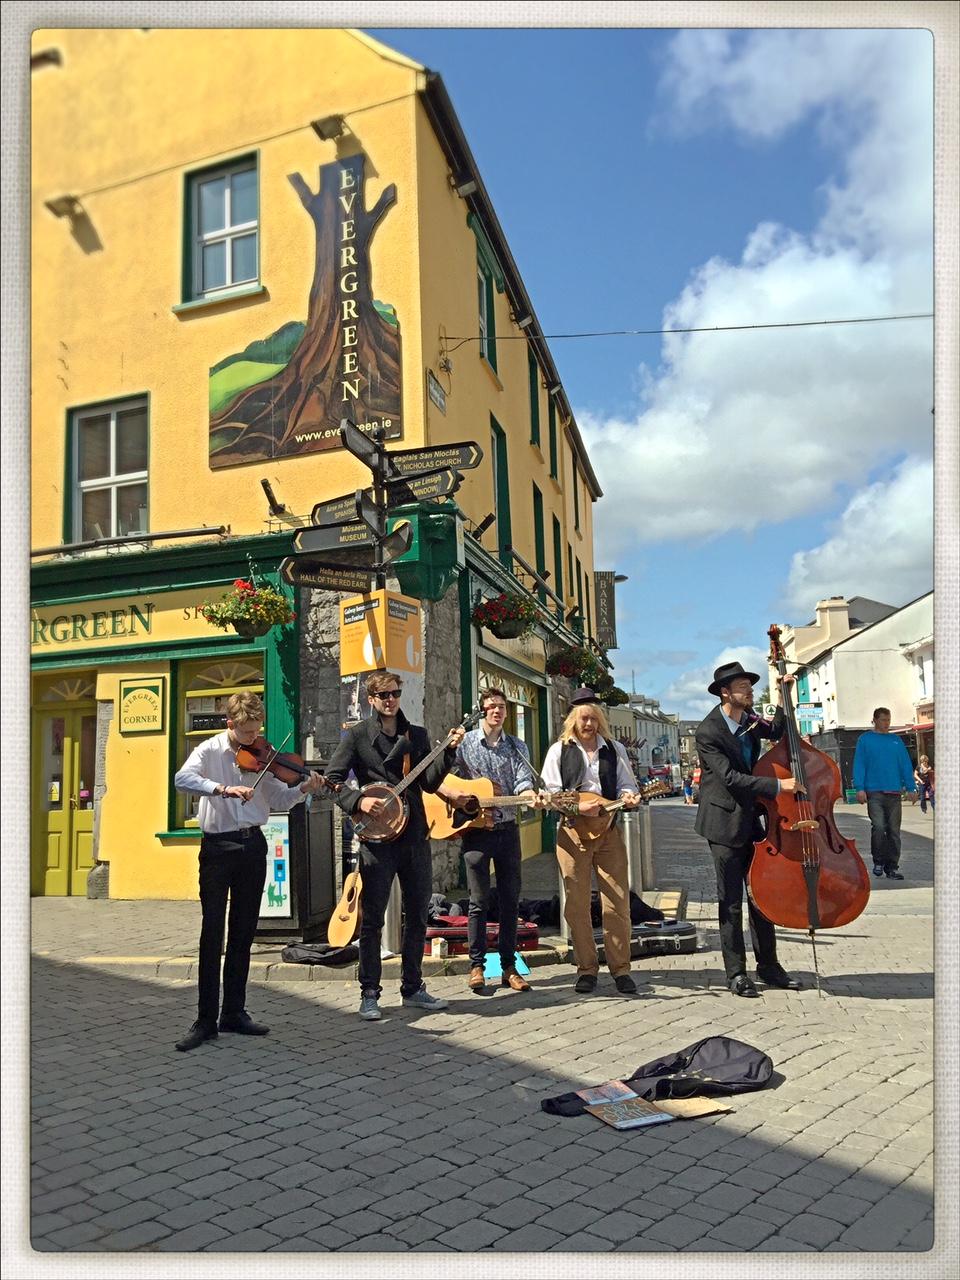 Galway, Ireland Buskers